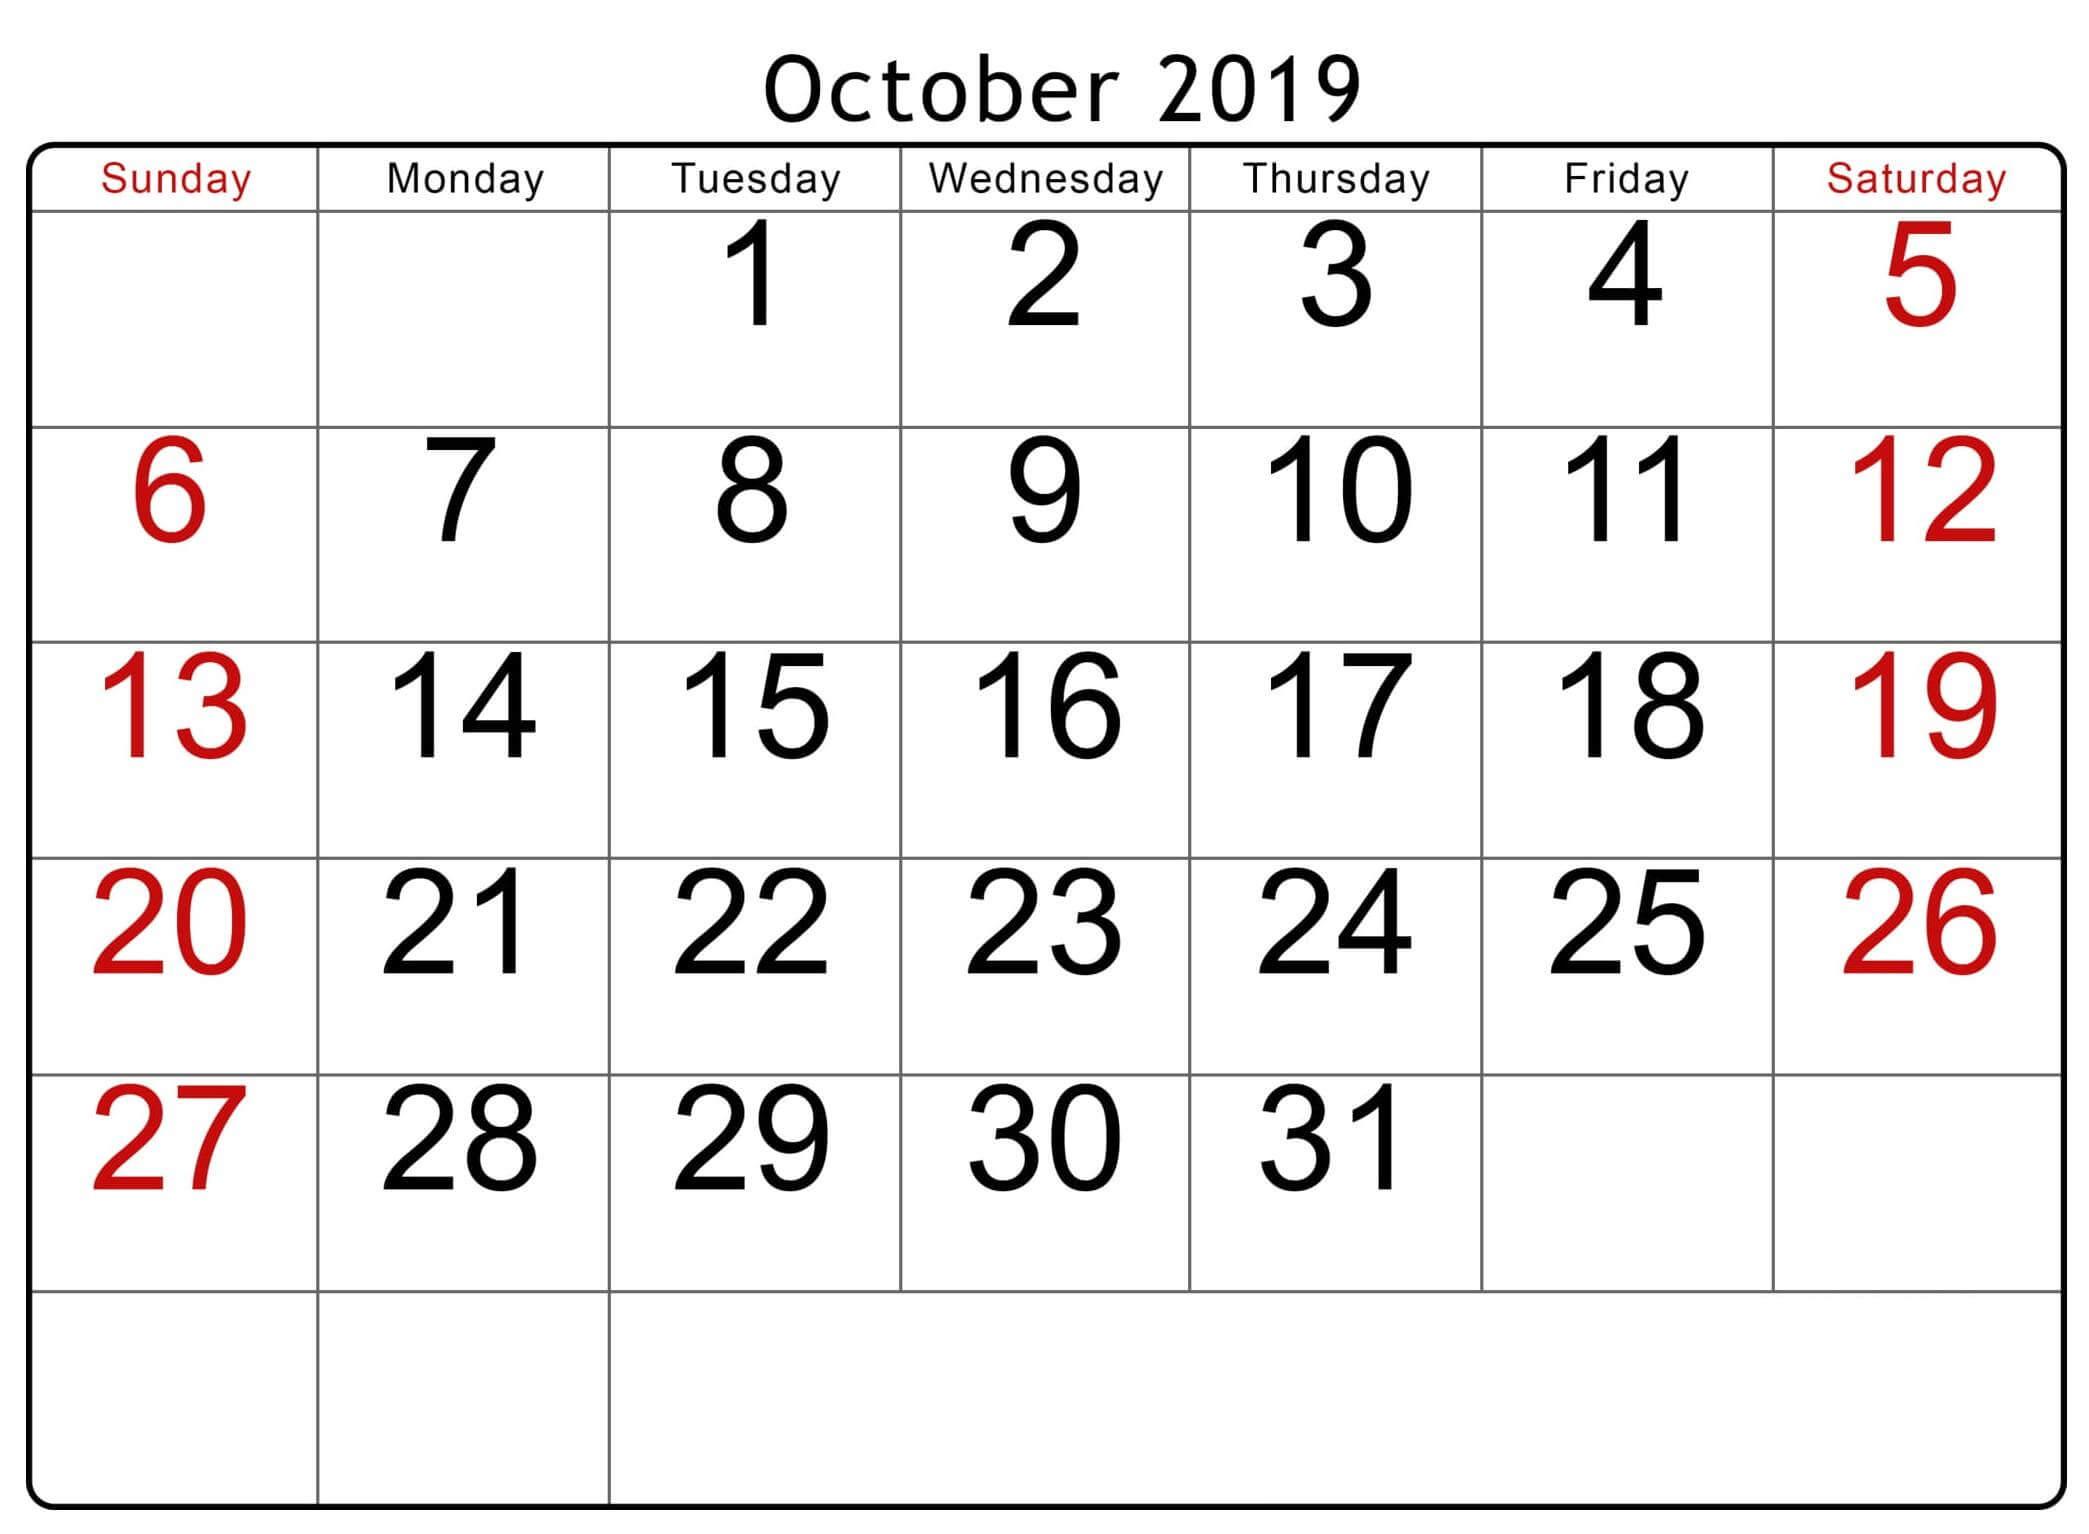 Printable October 2019 Calendar Australia With Holidays | Free within Calendar October 2019 Australia Images